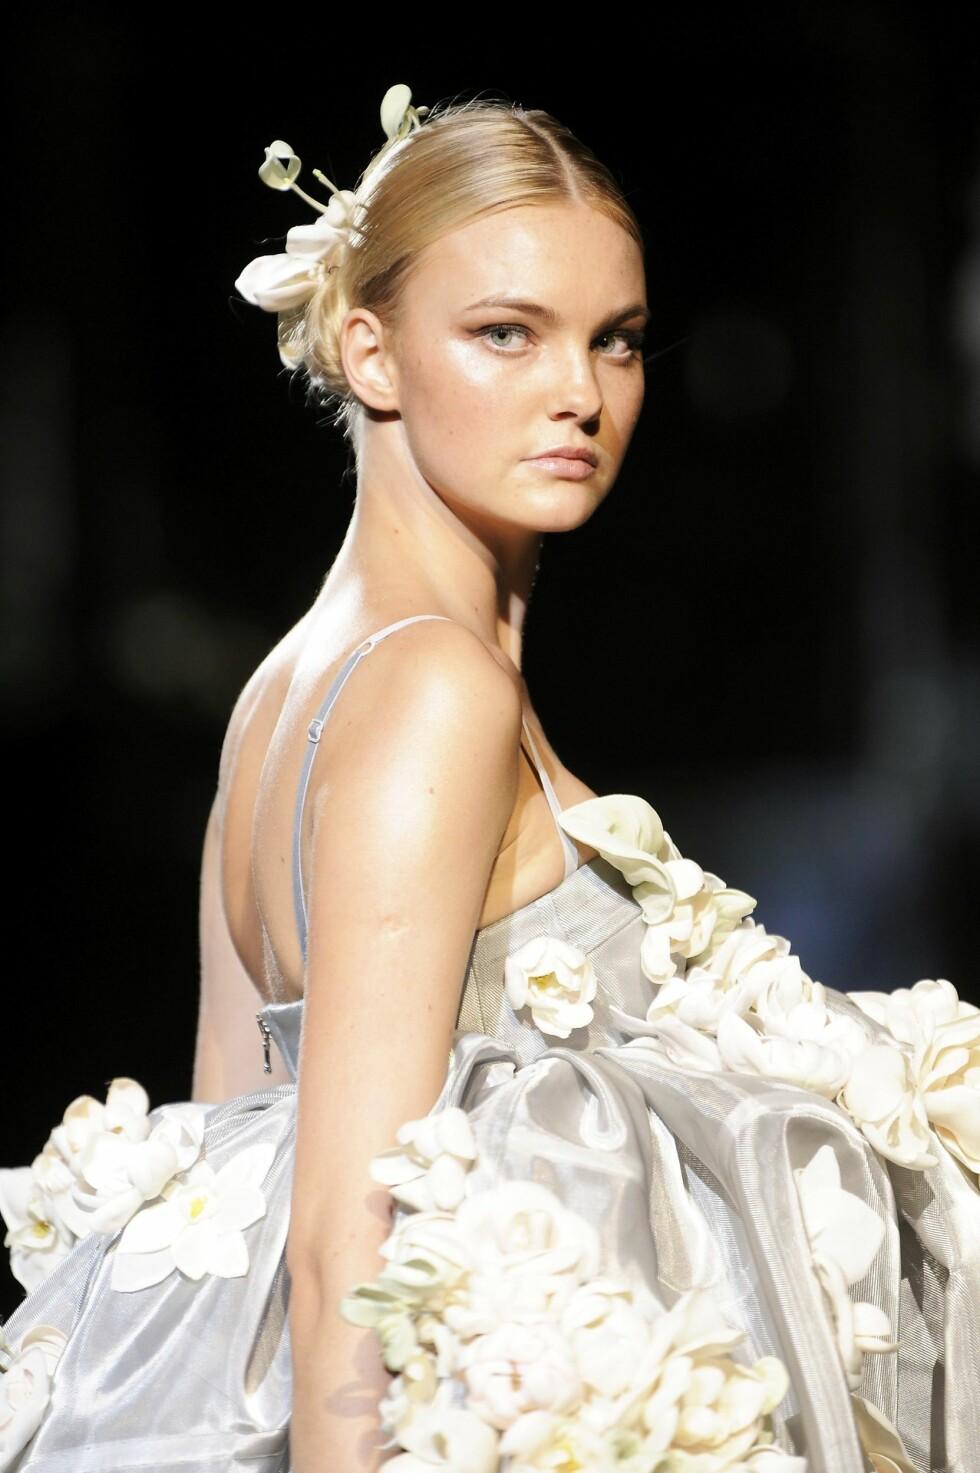 BLOMSTER: på kjole og i håret.(Dolce & Gabbana Spring/Summer 2009.) Foto: All Over PressAll Over Press